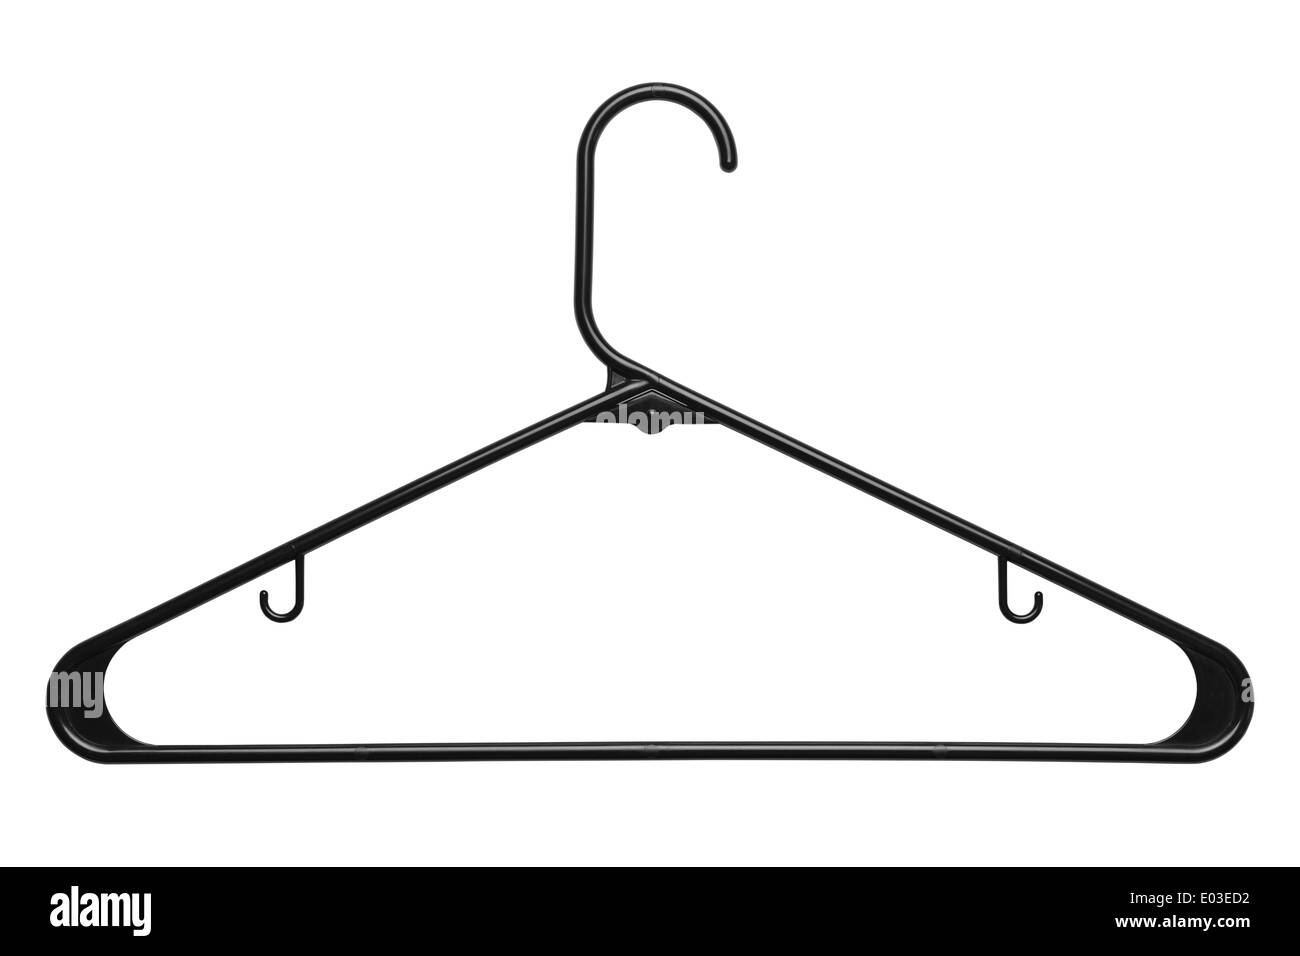 Black Plastic Clothes Hanger Isolated on White Background. - Stock Image